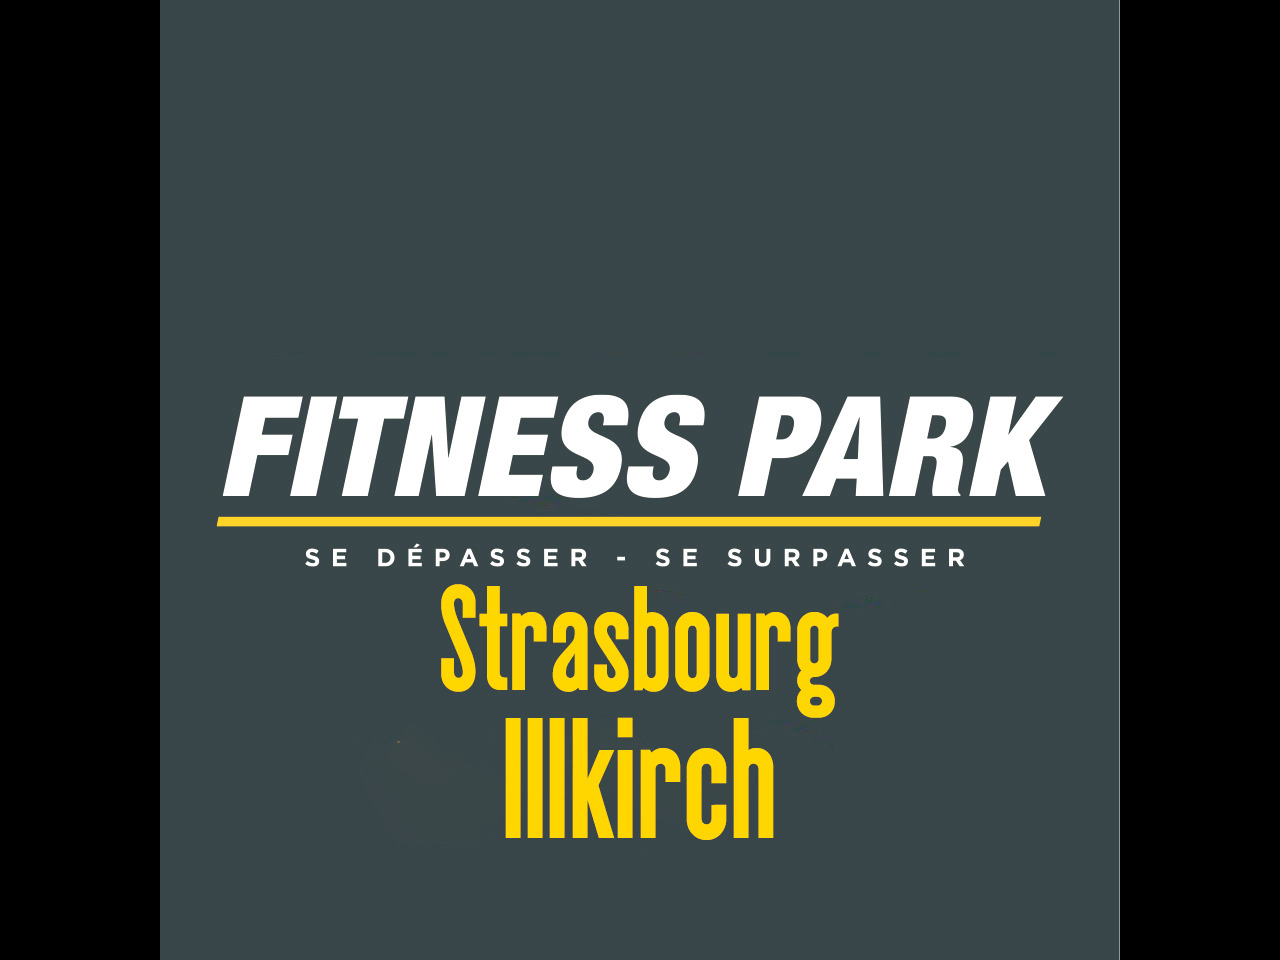 Fitness Park Illkirch